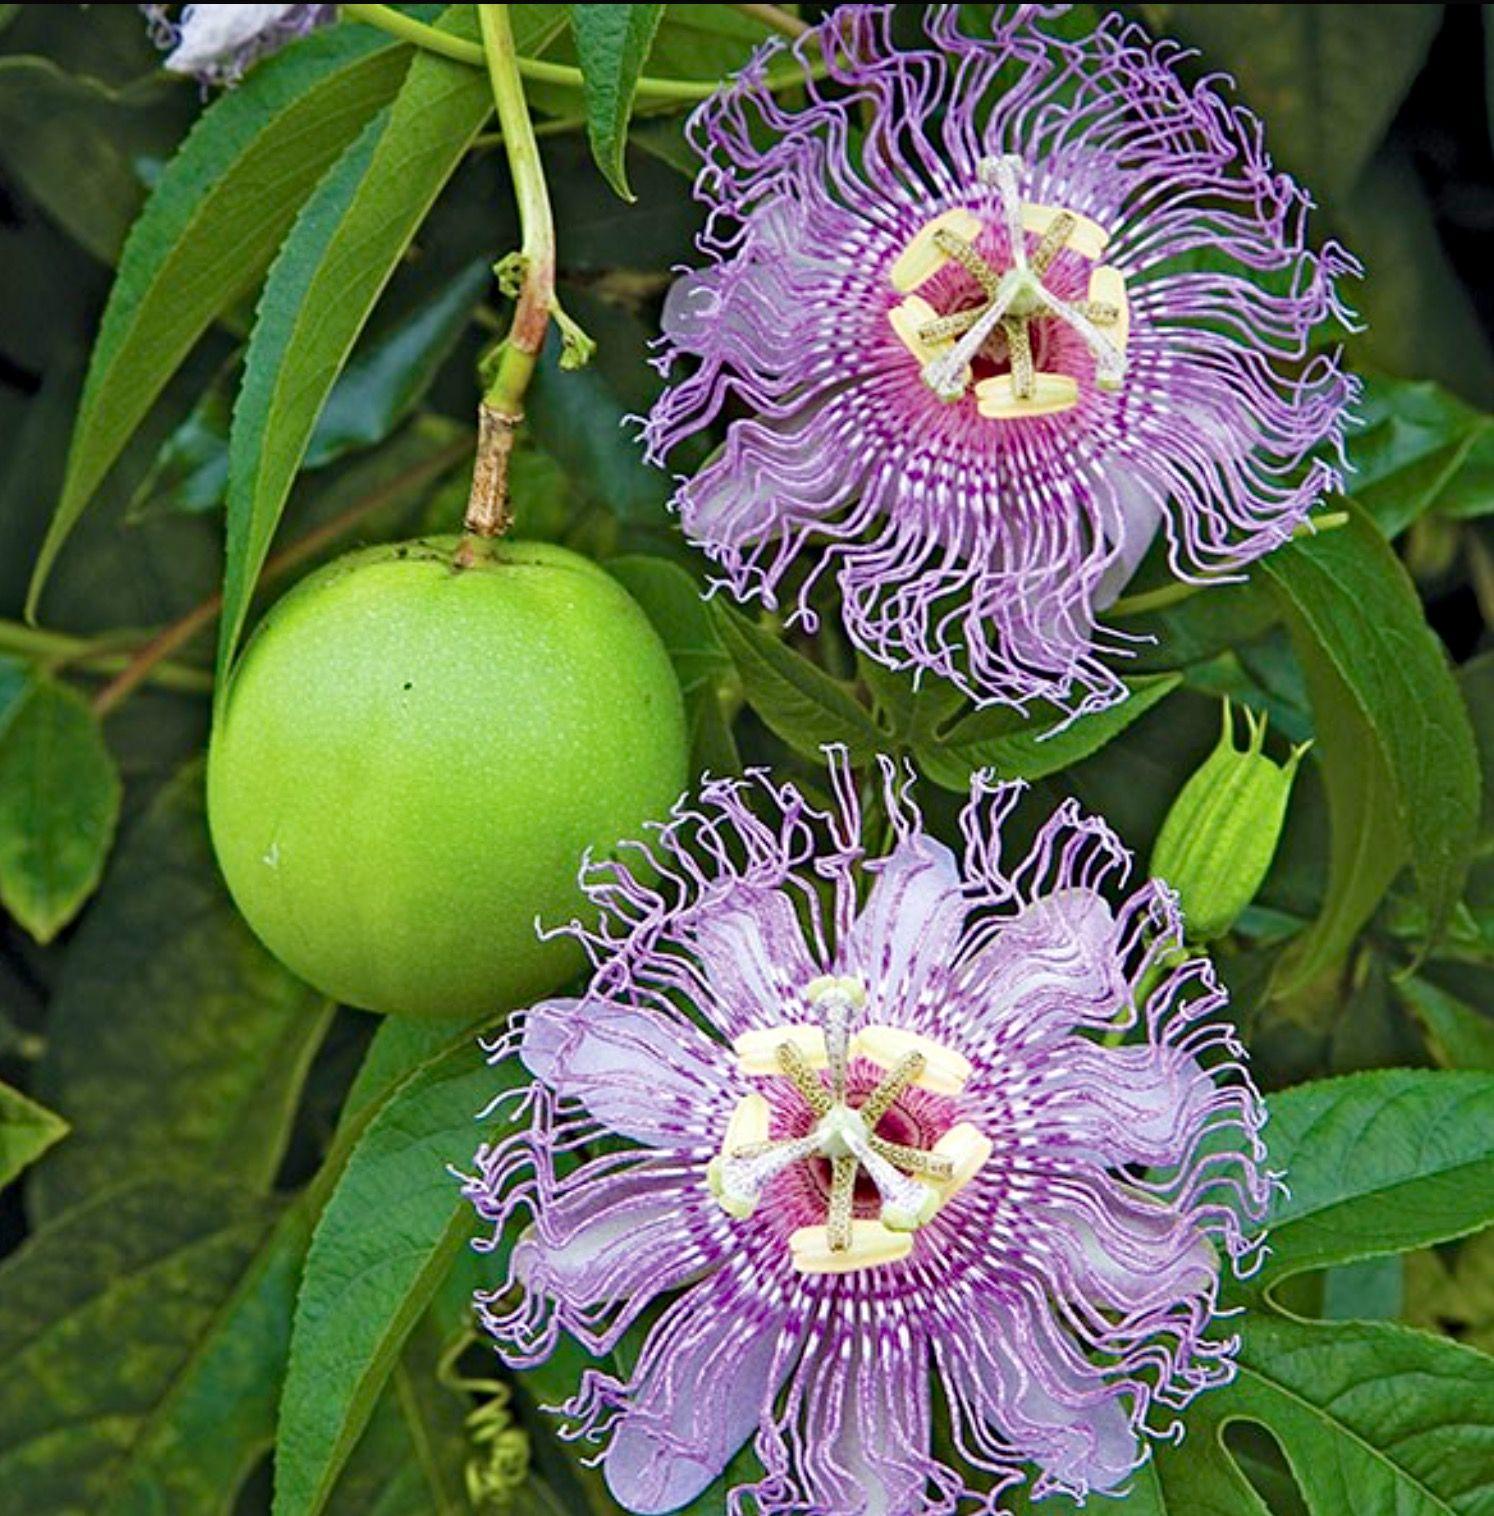 Passionflower Passiflora Incarnata Vine Edible Fruit Wildlife Attractant Flowers Passion Flower Plant Passion Flower Pollinating Flowers